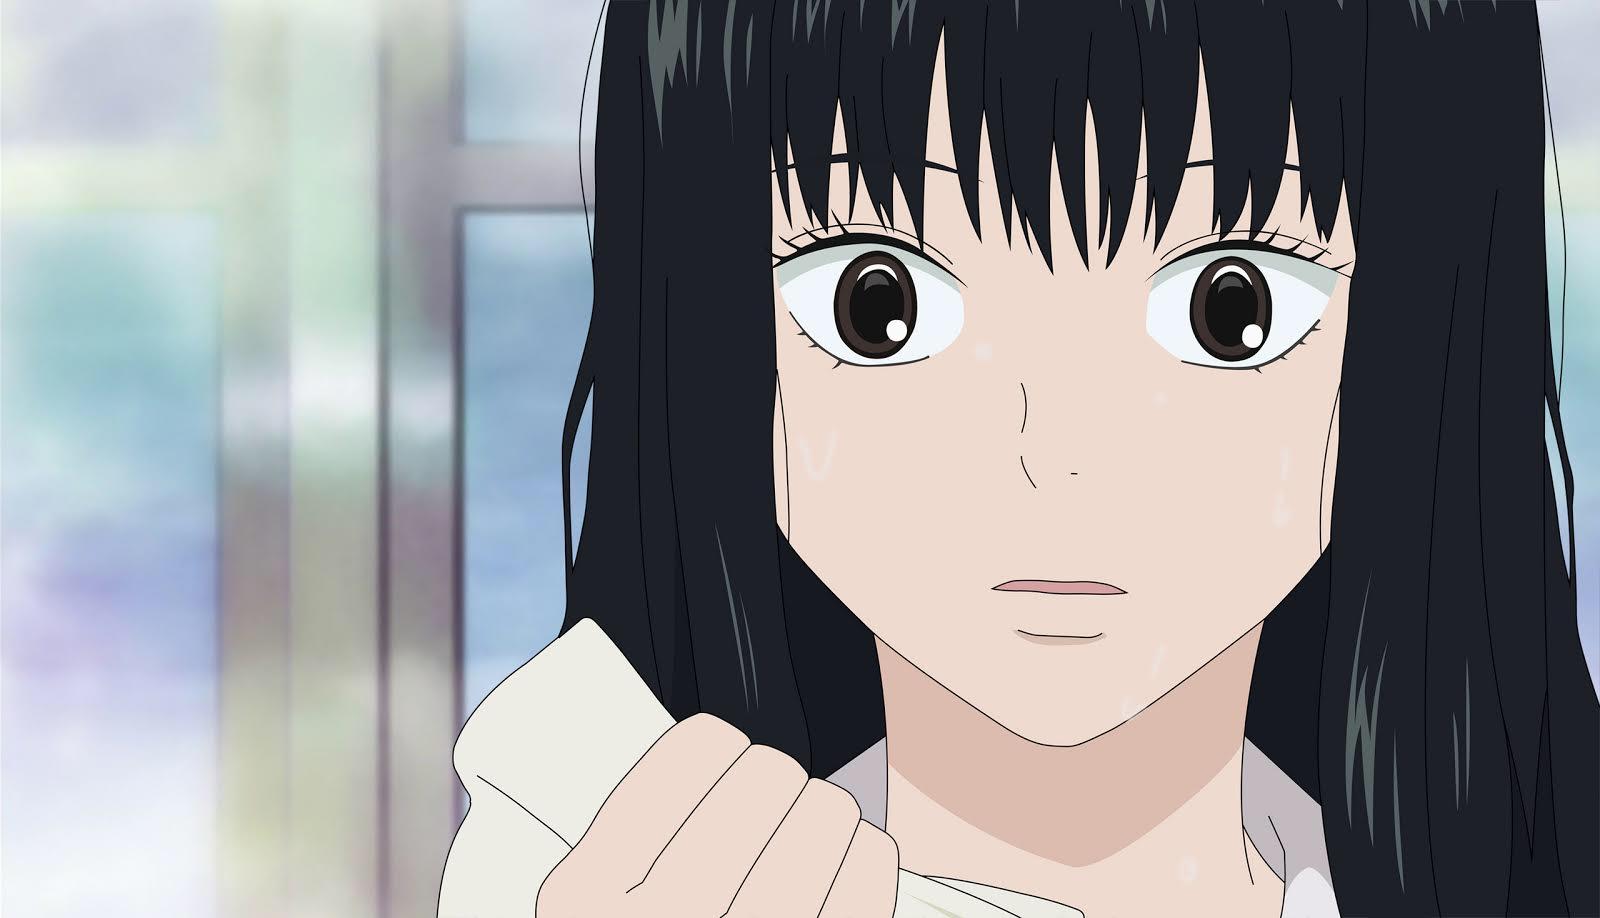 Pin by stef🥀 on anime Kimi ni todoke, Anime, Black hair